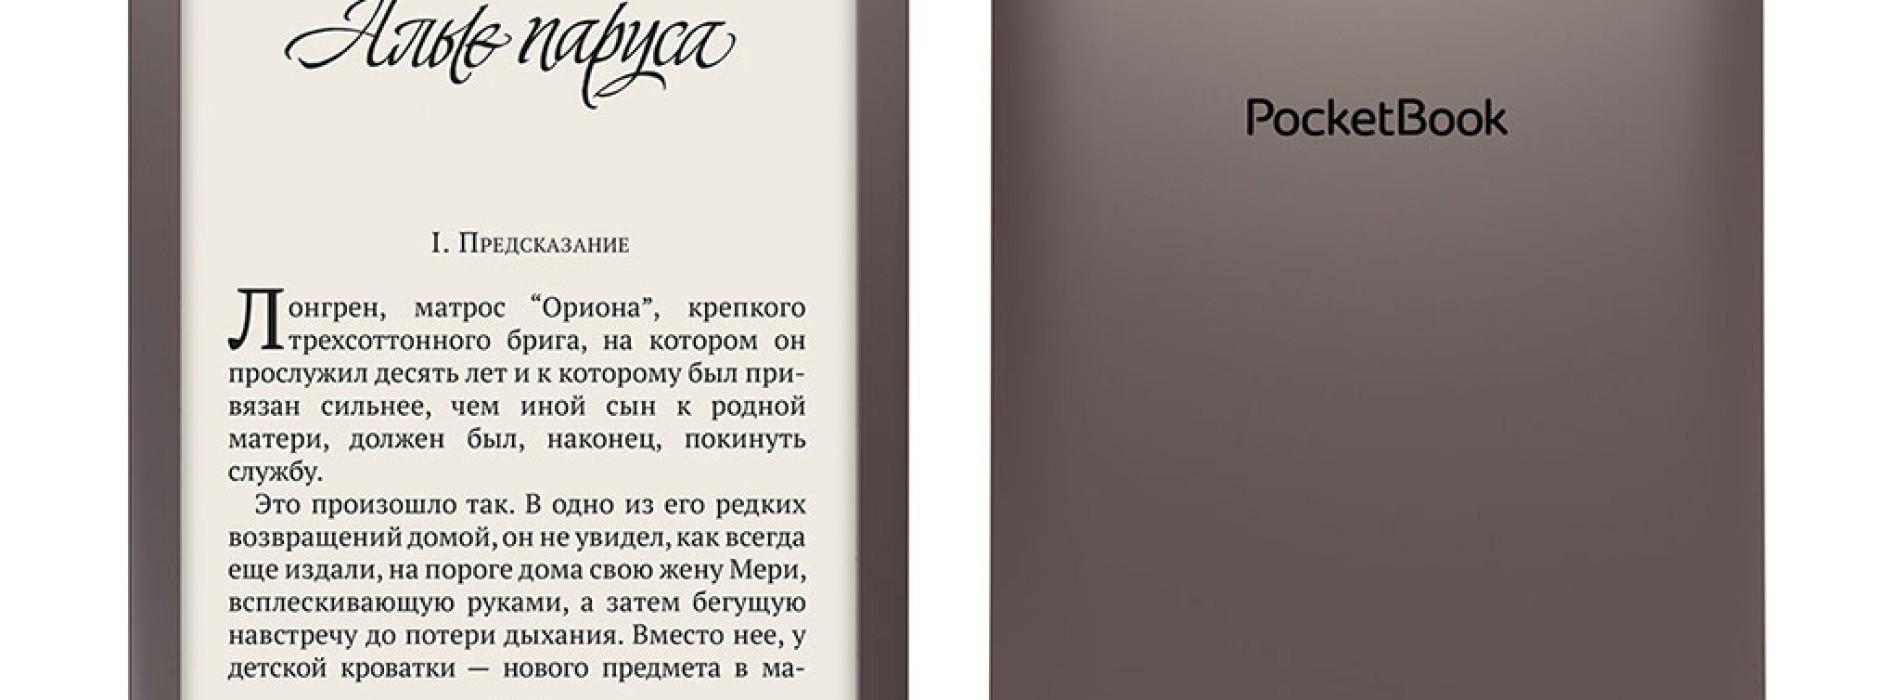 Pocketbook chystá Inkpad 3